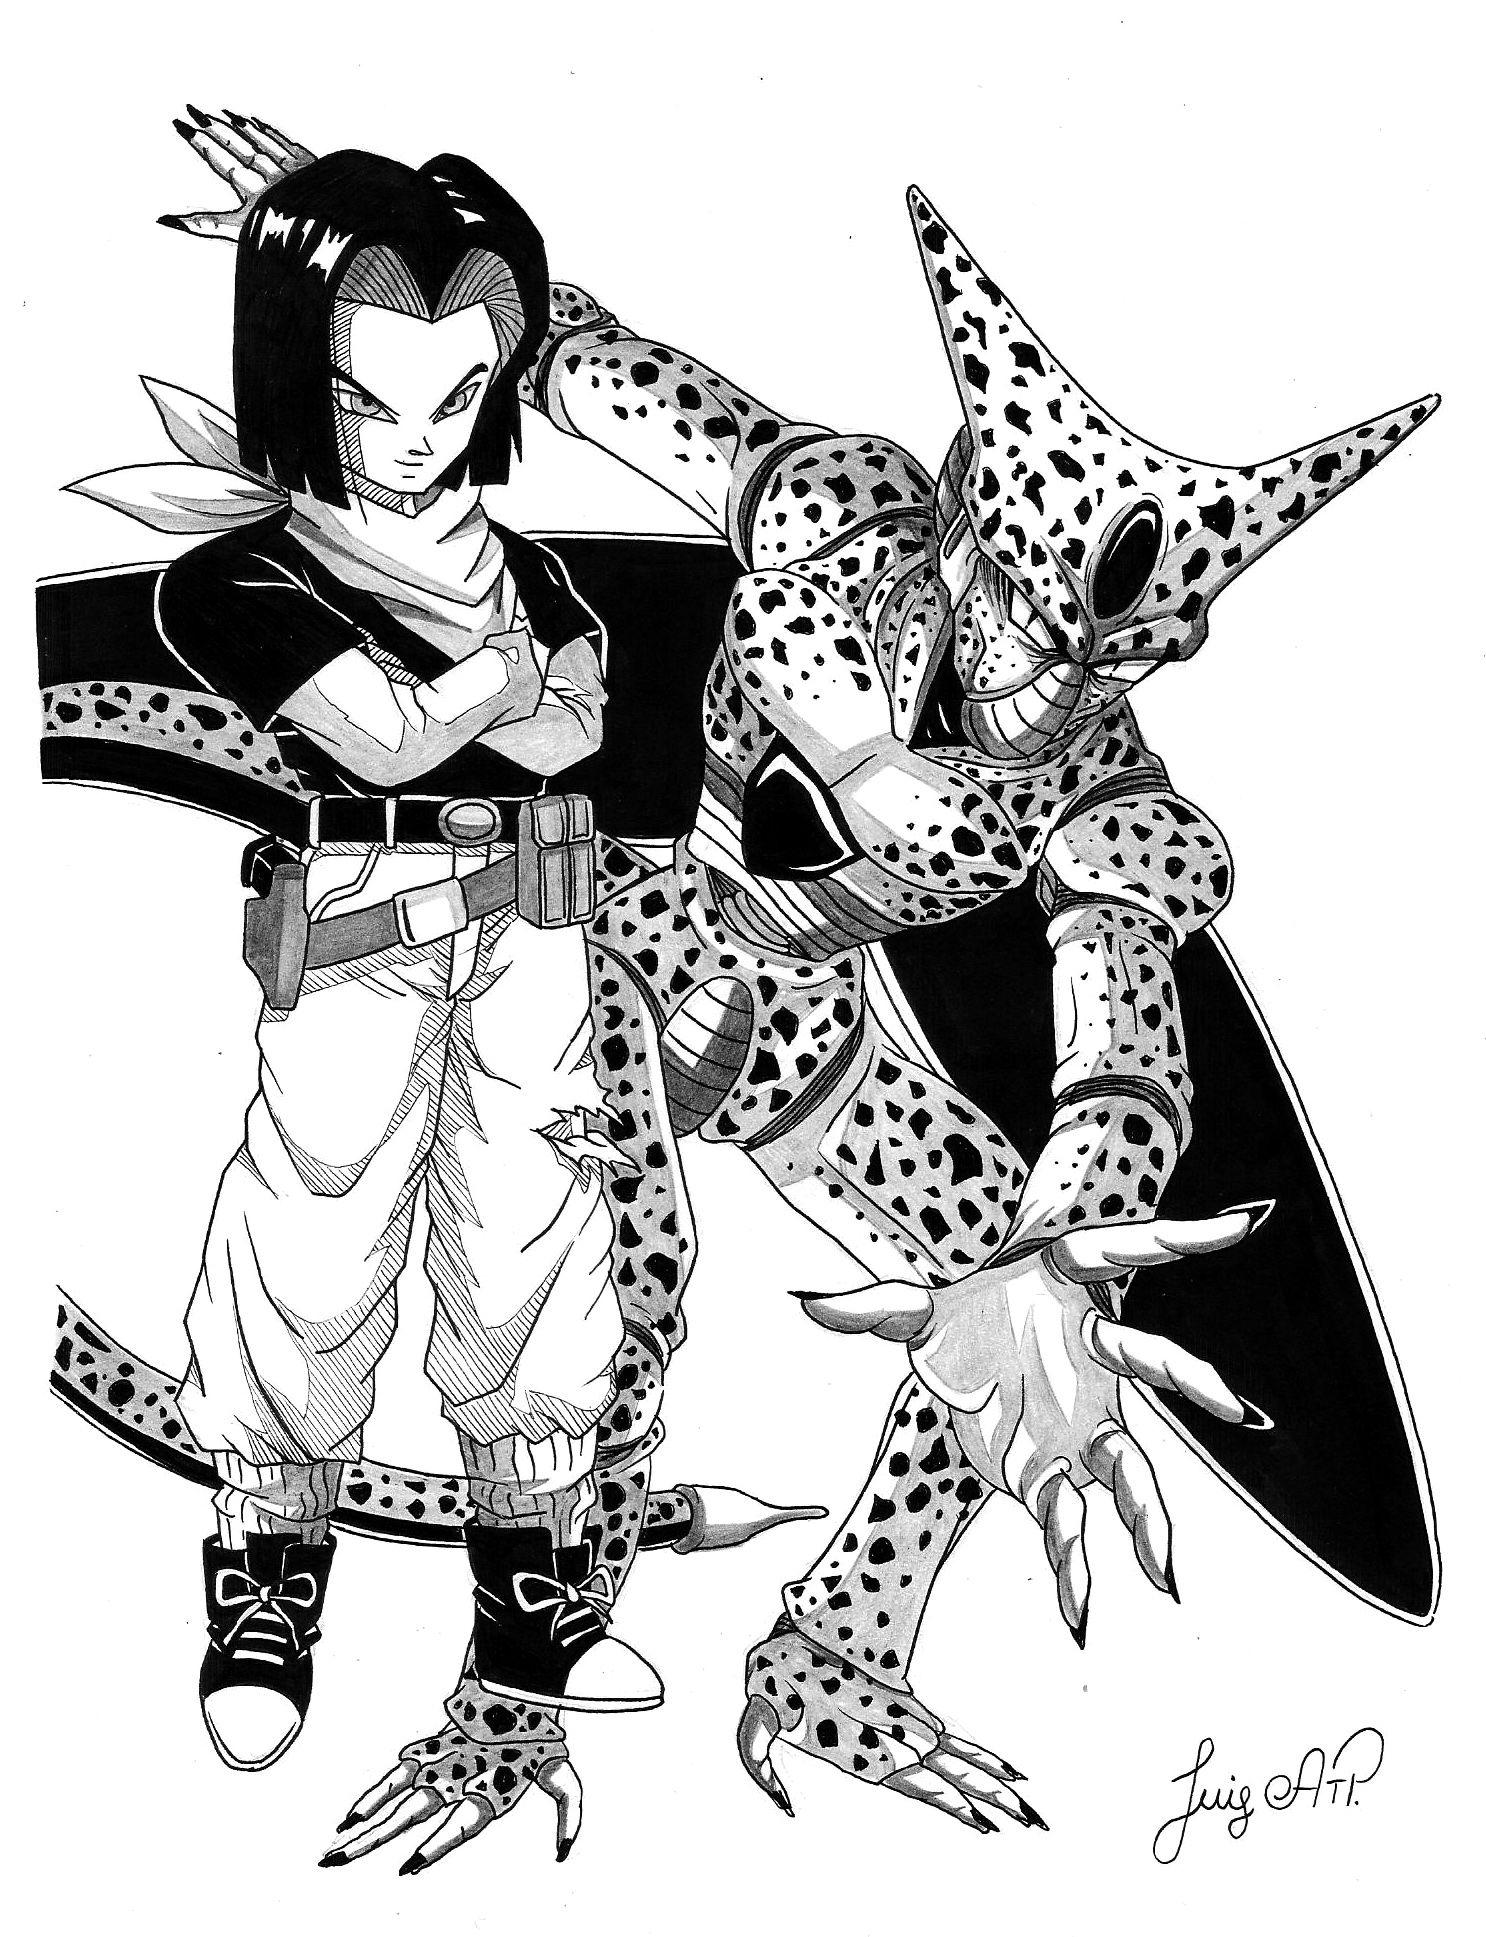 Androide Numero 17 Y Cell Fanart Dragon Ball Z Drawing Dibujo Fanart Dragones Dibujos